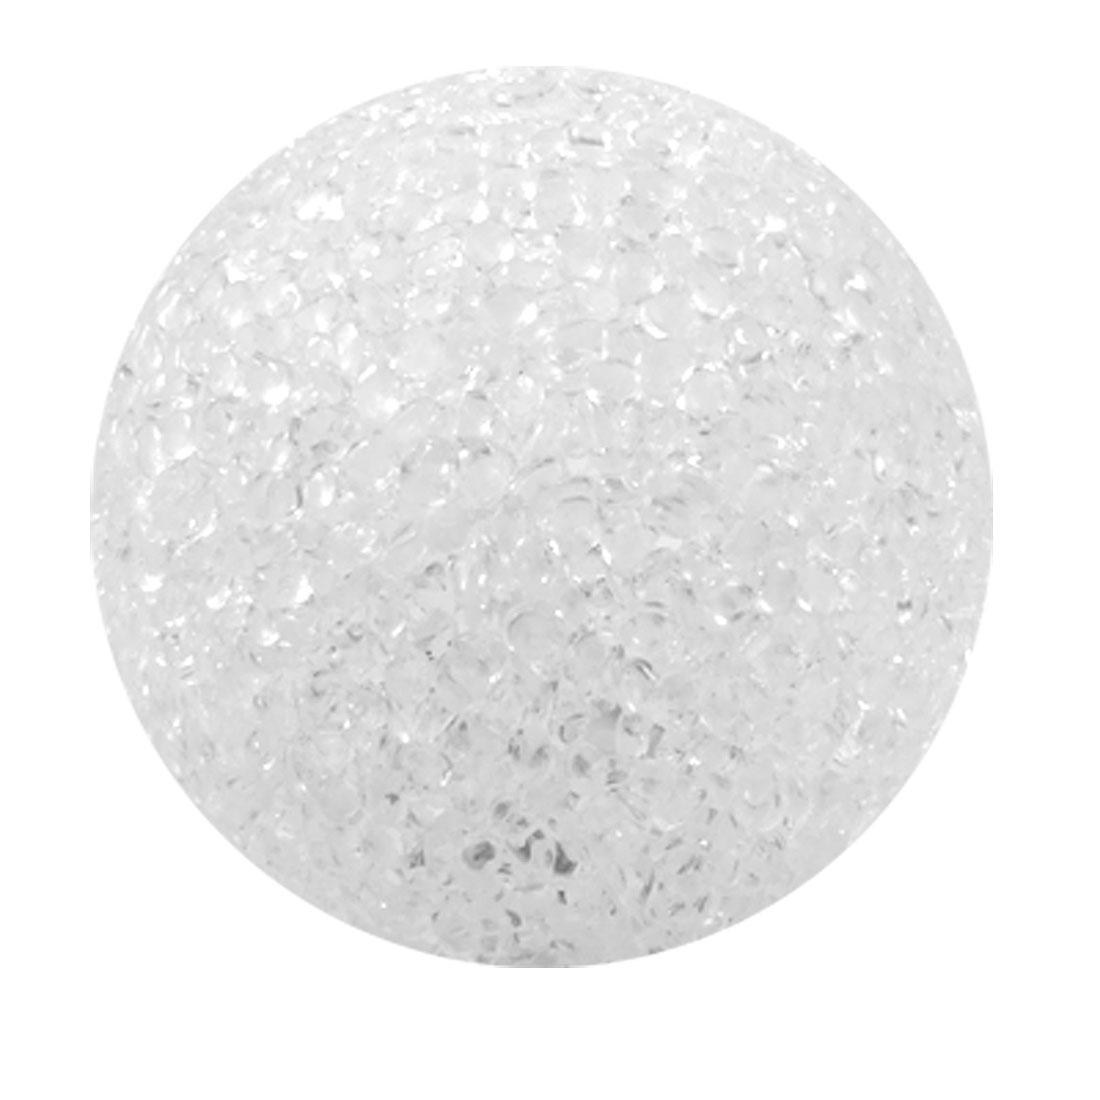 White Plastic Crystal Ball Design Change Light LED Lamp Home Decoration